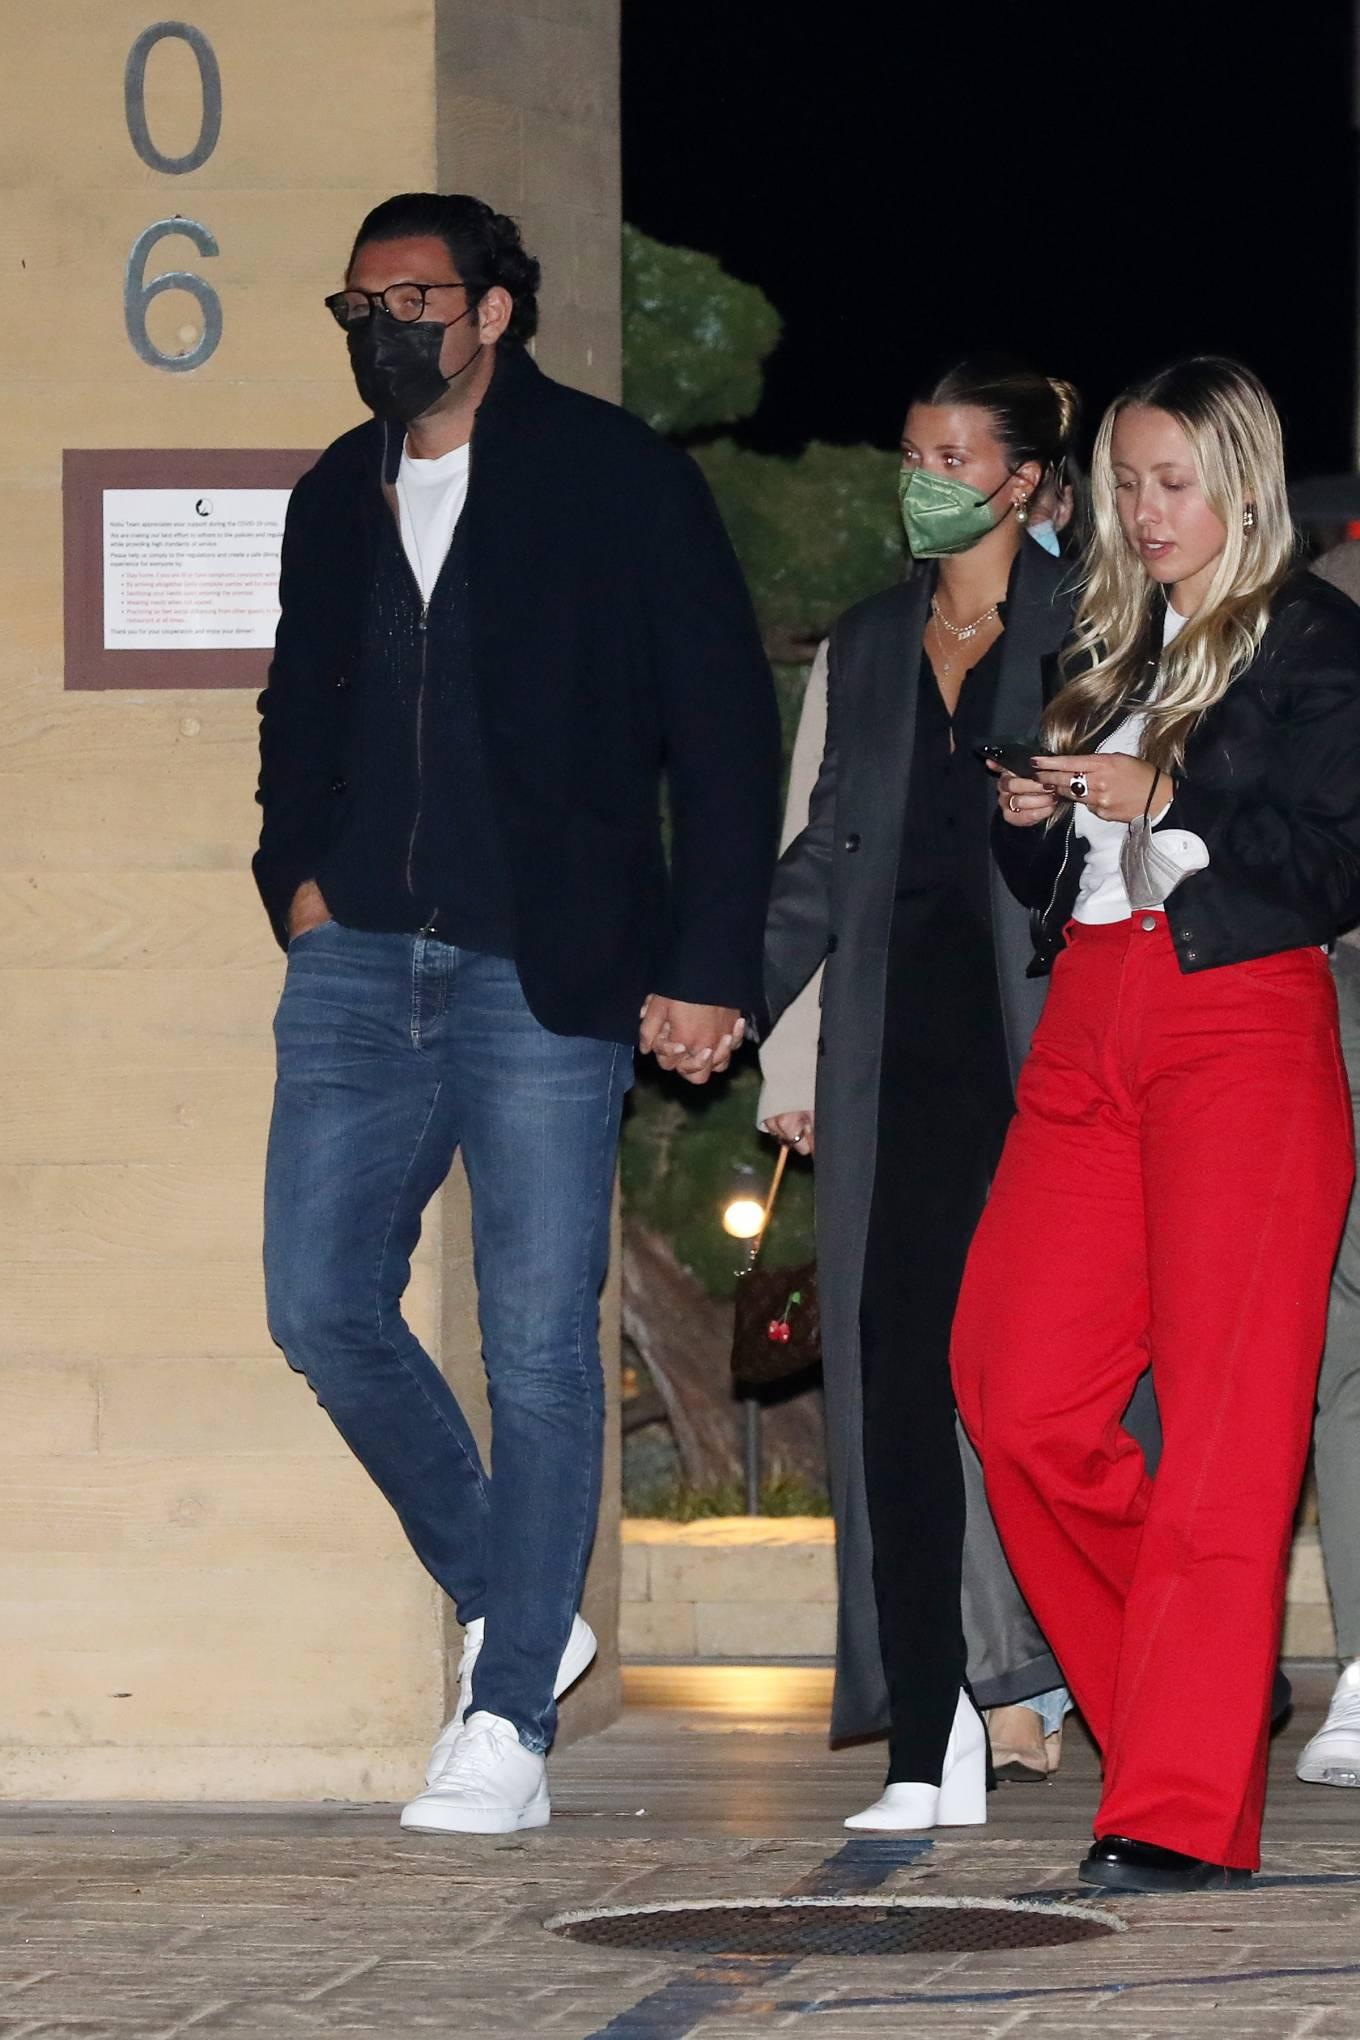 Sofia Richie - With boyfriend Elliot Grainge at Nobu in Malibu